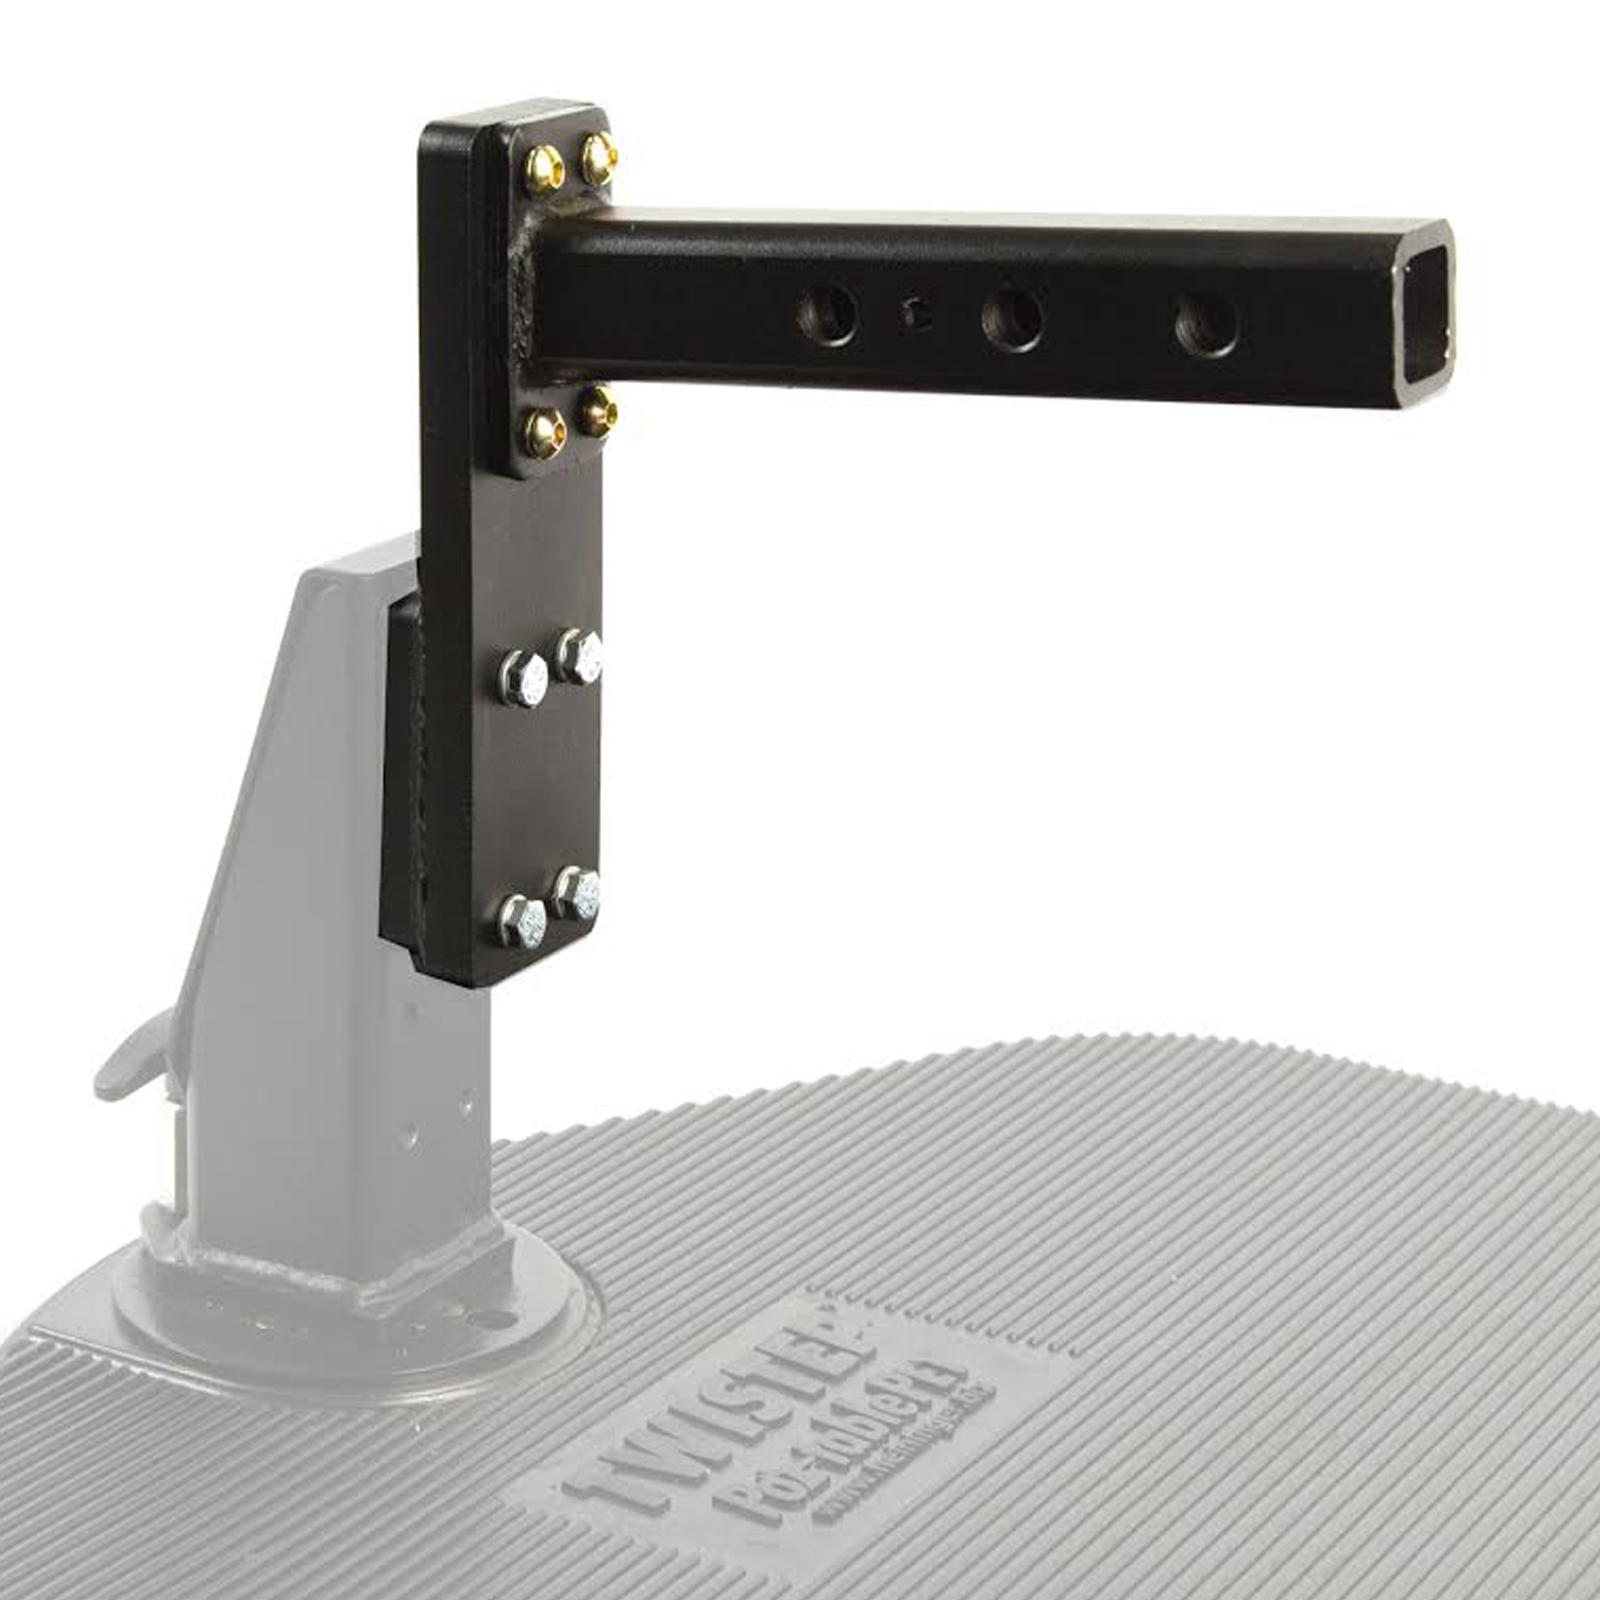 Heininger Automotive PortablePet Twistep Extension Bracket 3053 Add Clearance